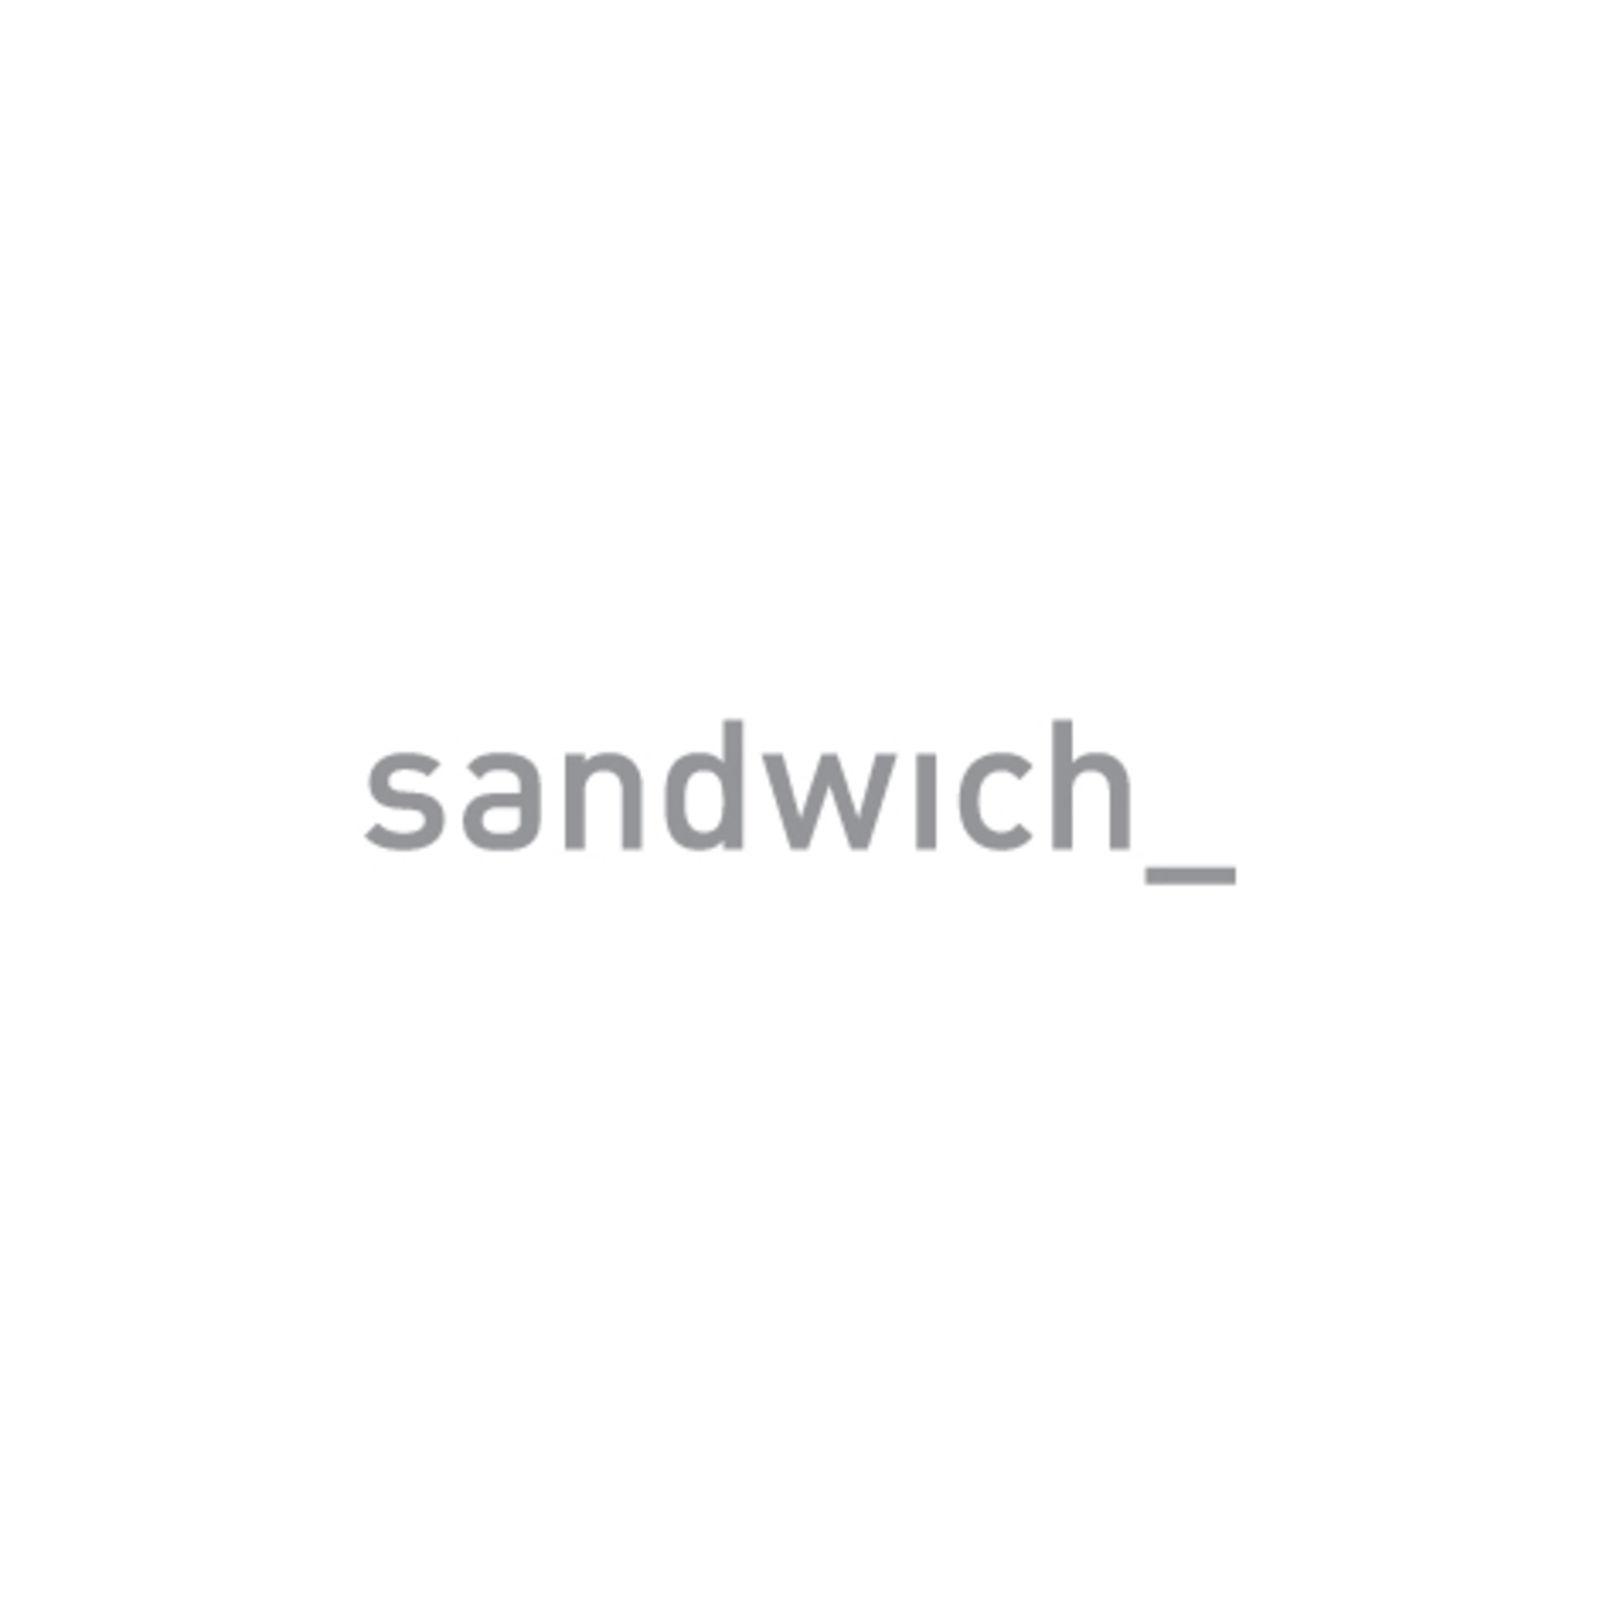 sandwich_ (Image 1)